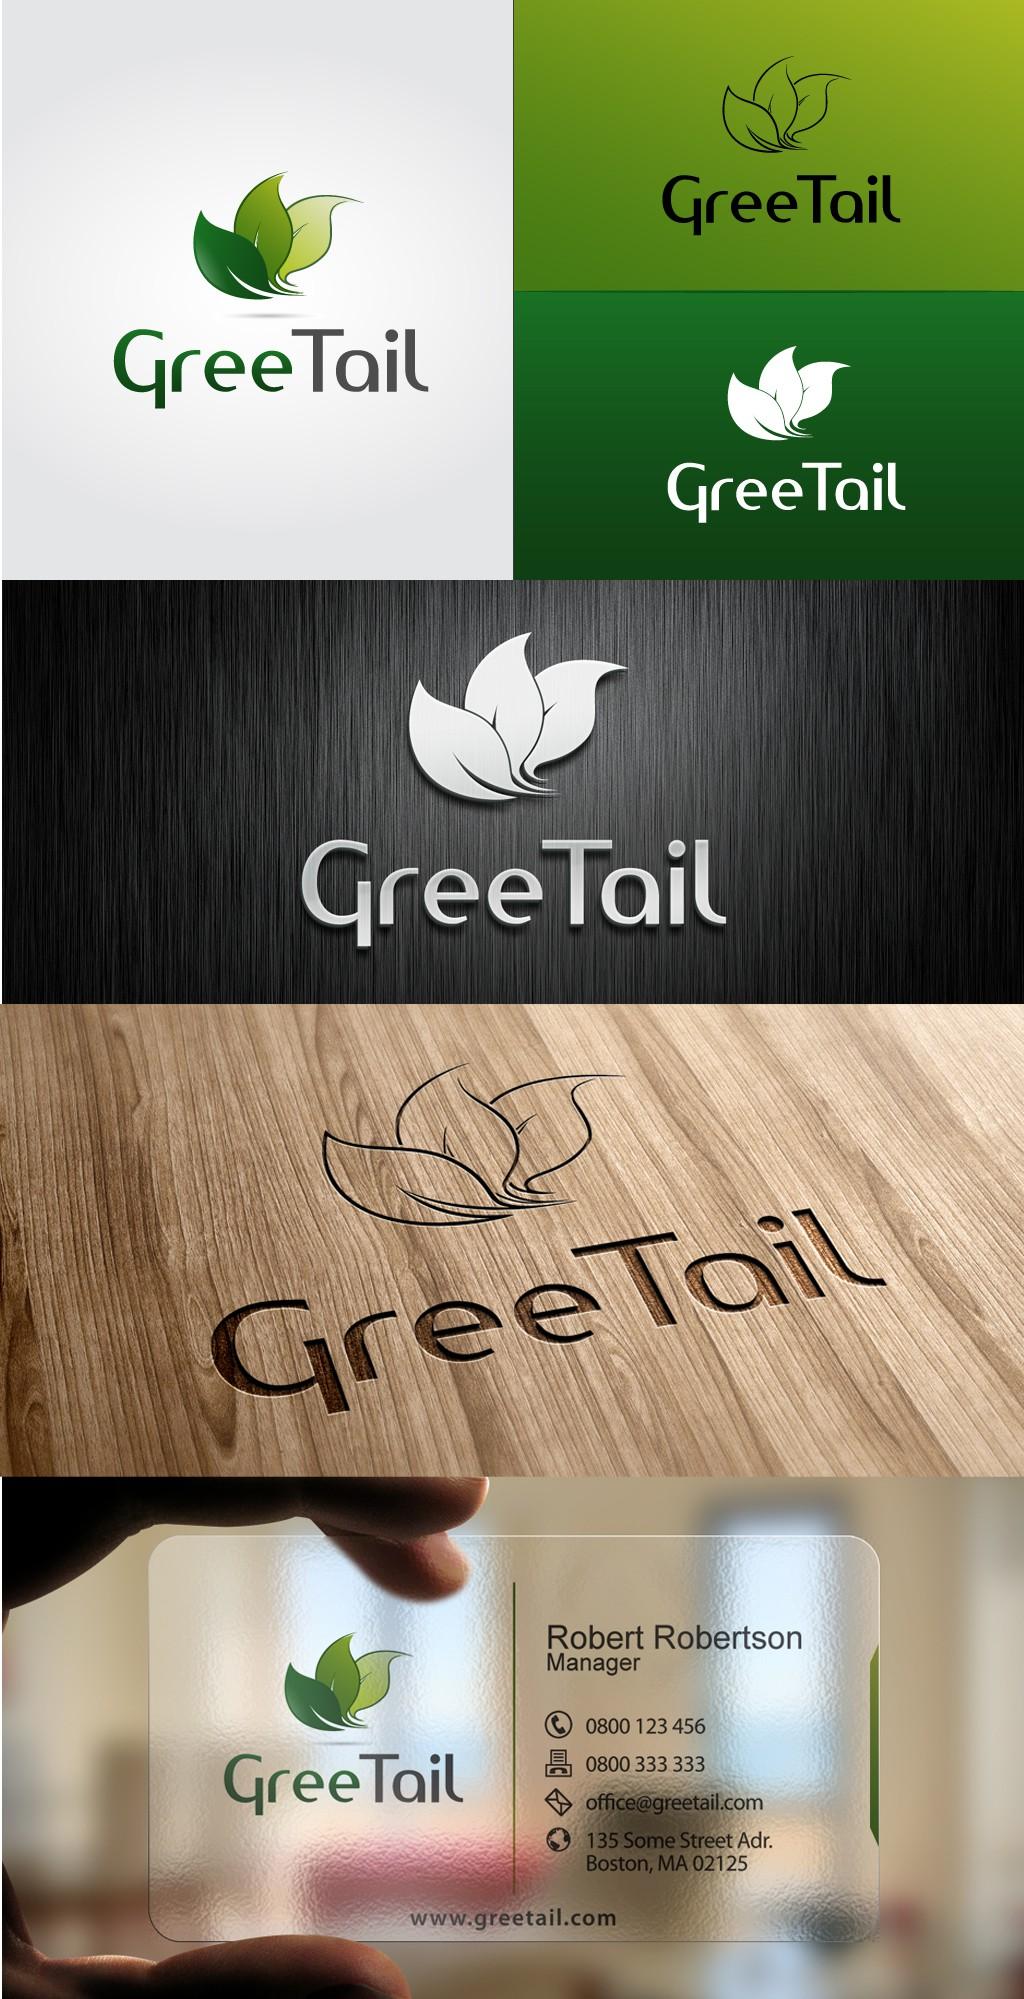 logo for Greetail